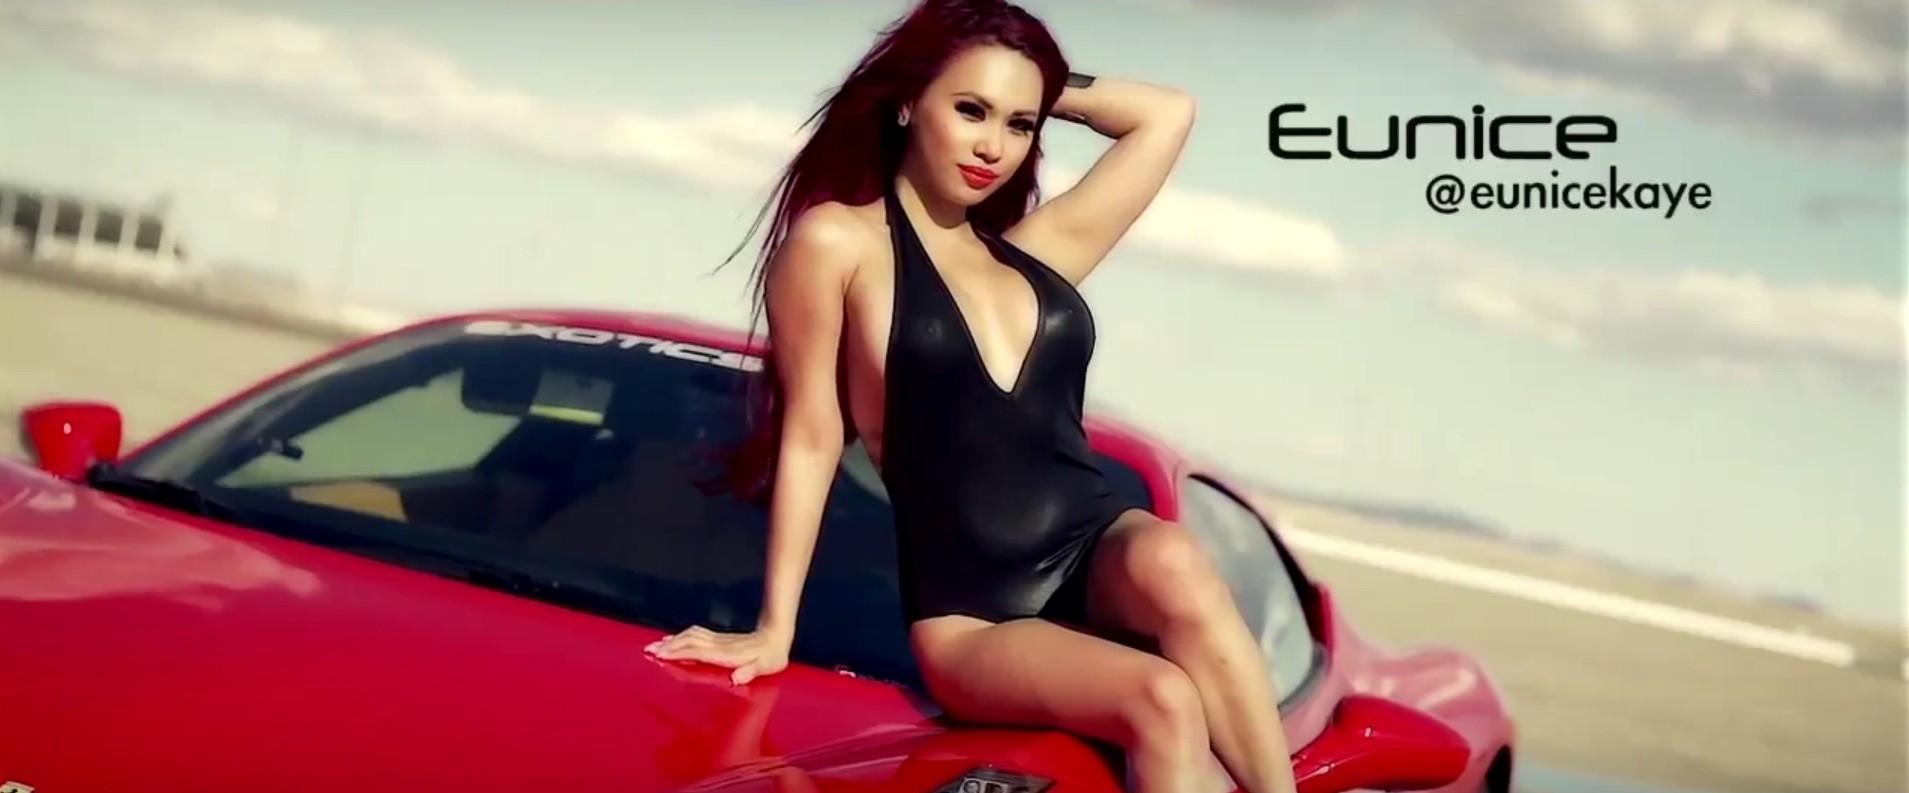 ... Exotic Women Get Joyrides in a Ferrari 458 6665cfc733